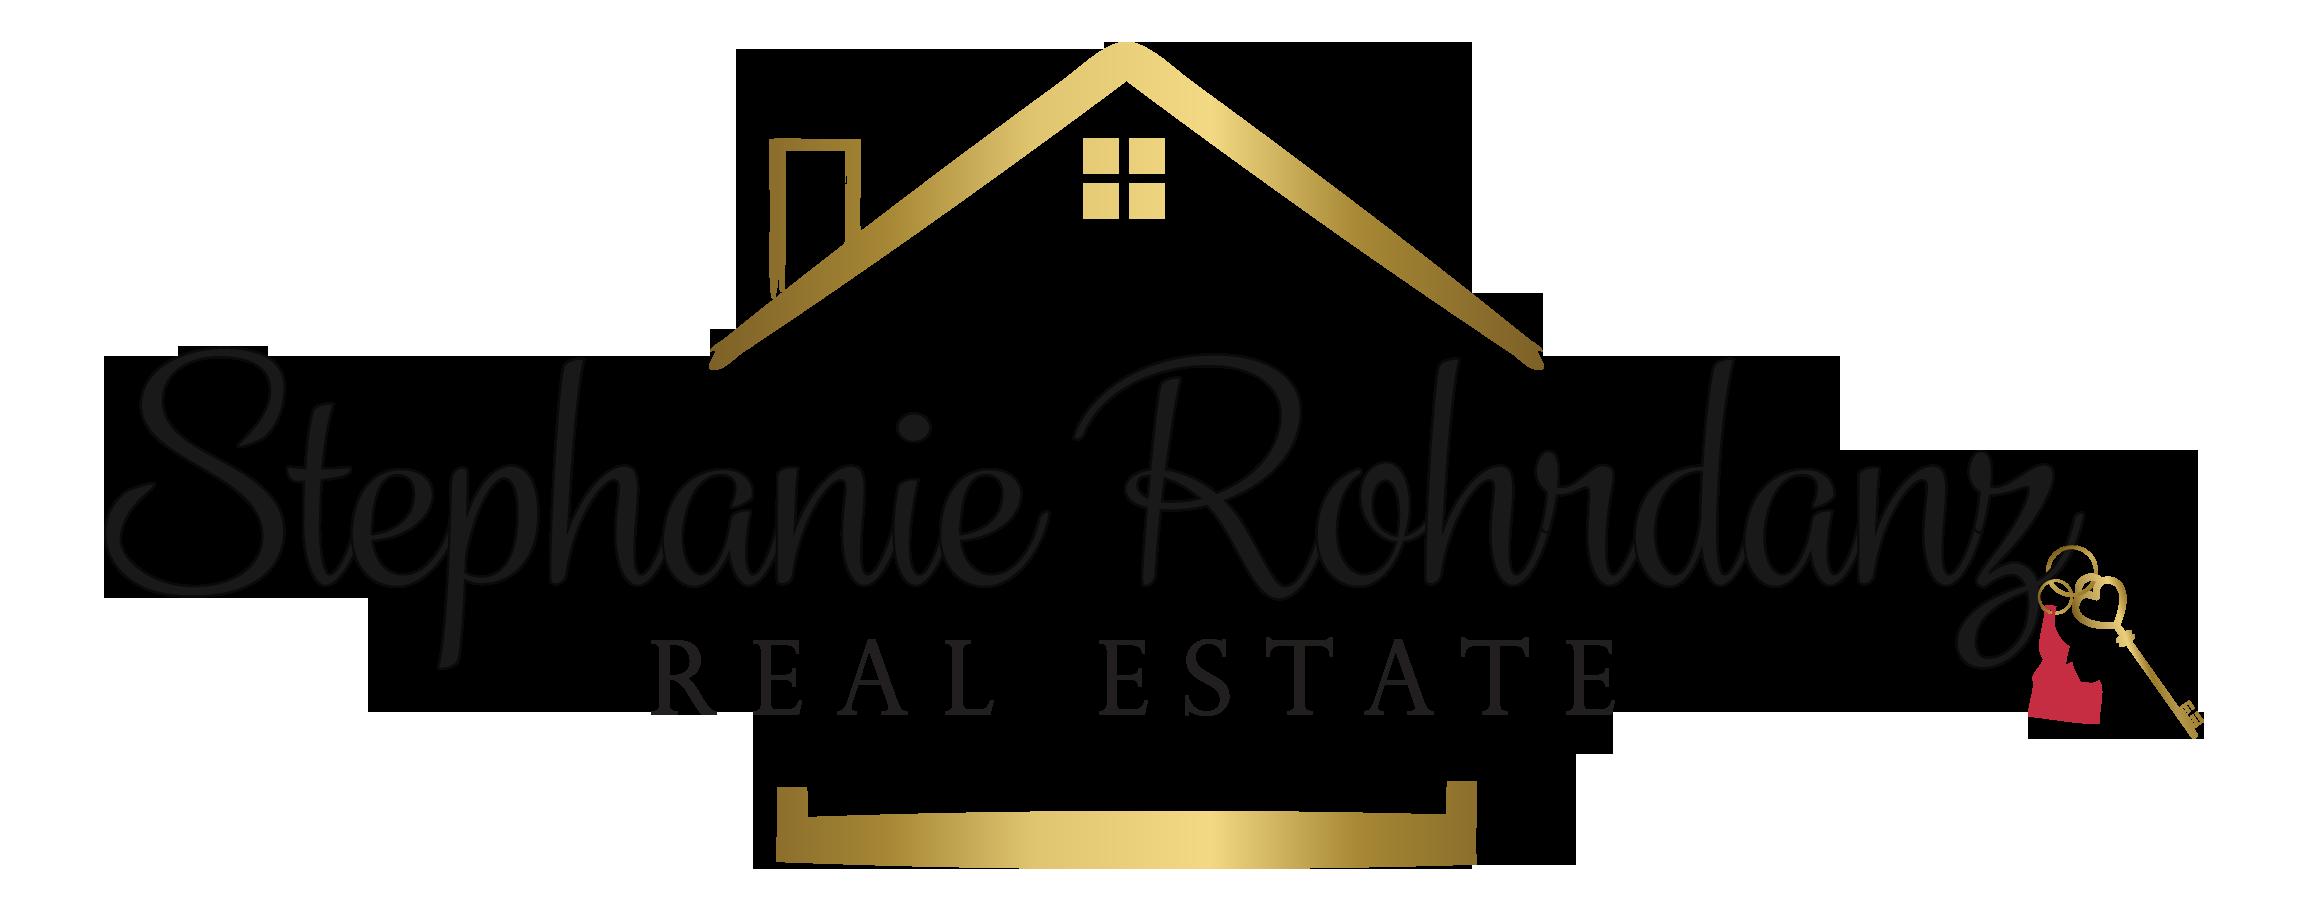 Rohrdanz Investments logo